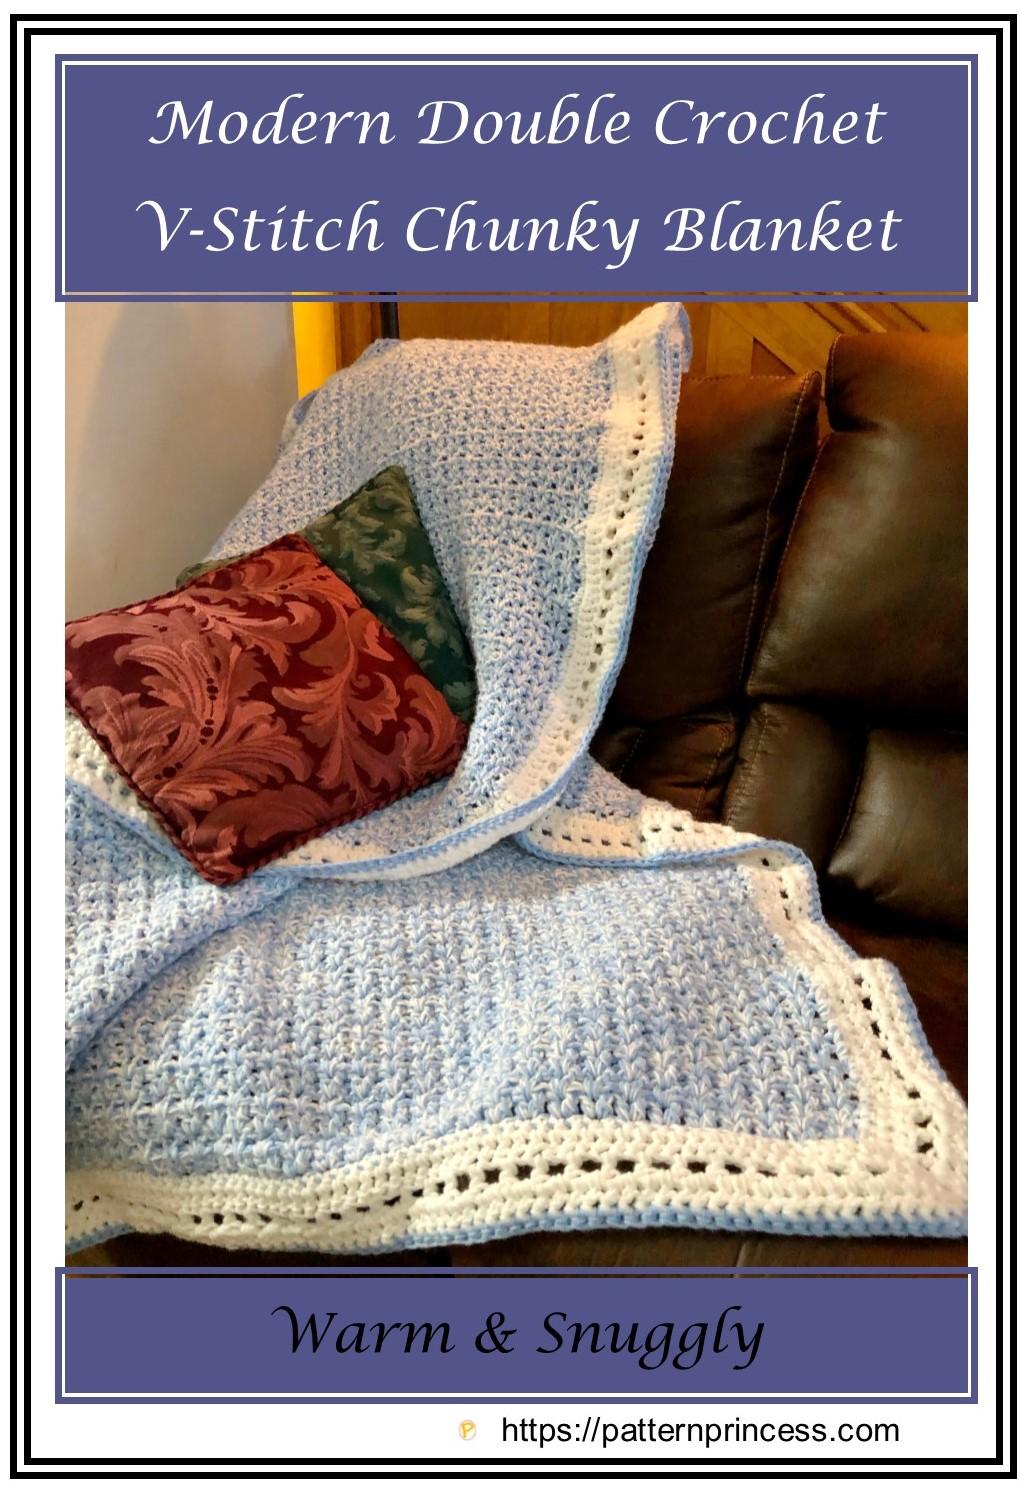 Modern Double Crochet V-Stitch Chunky Blanket